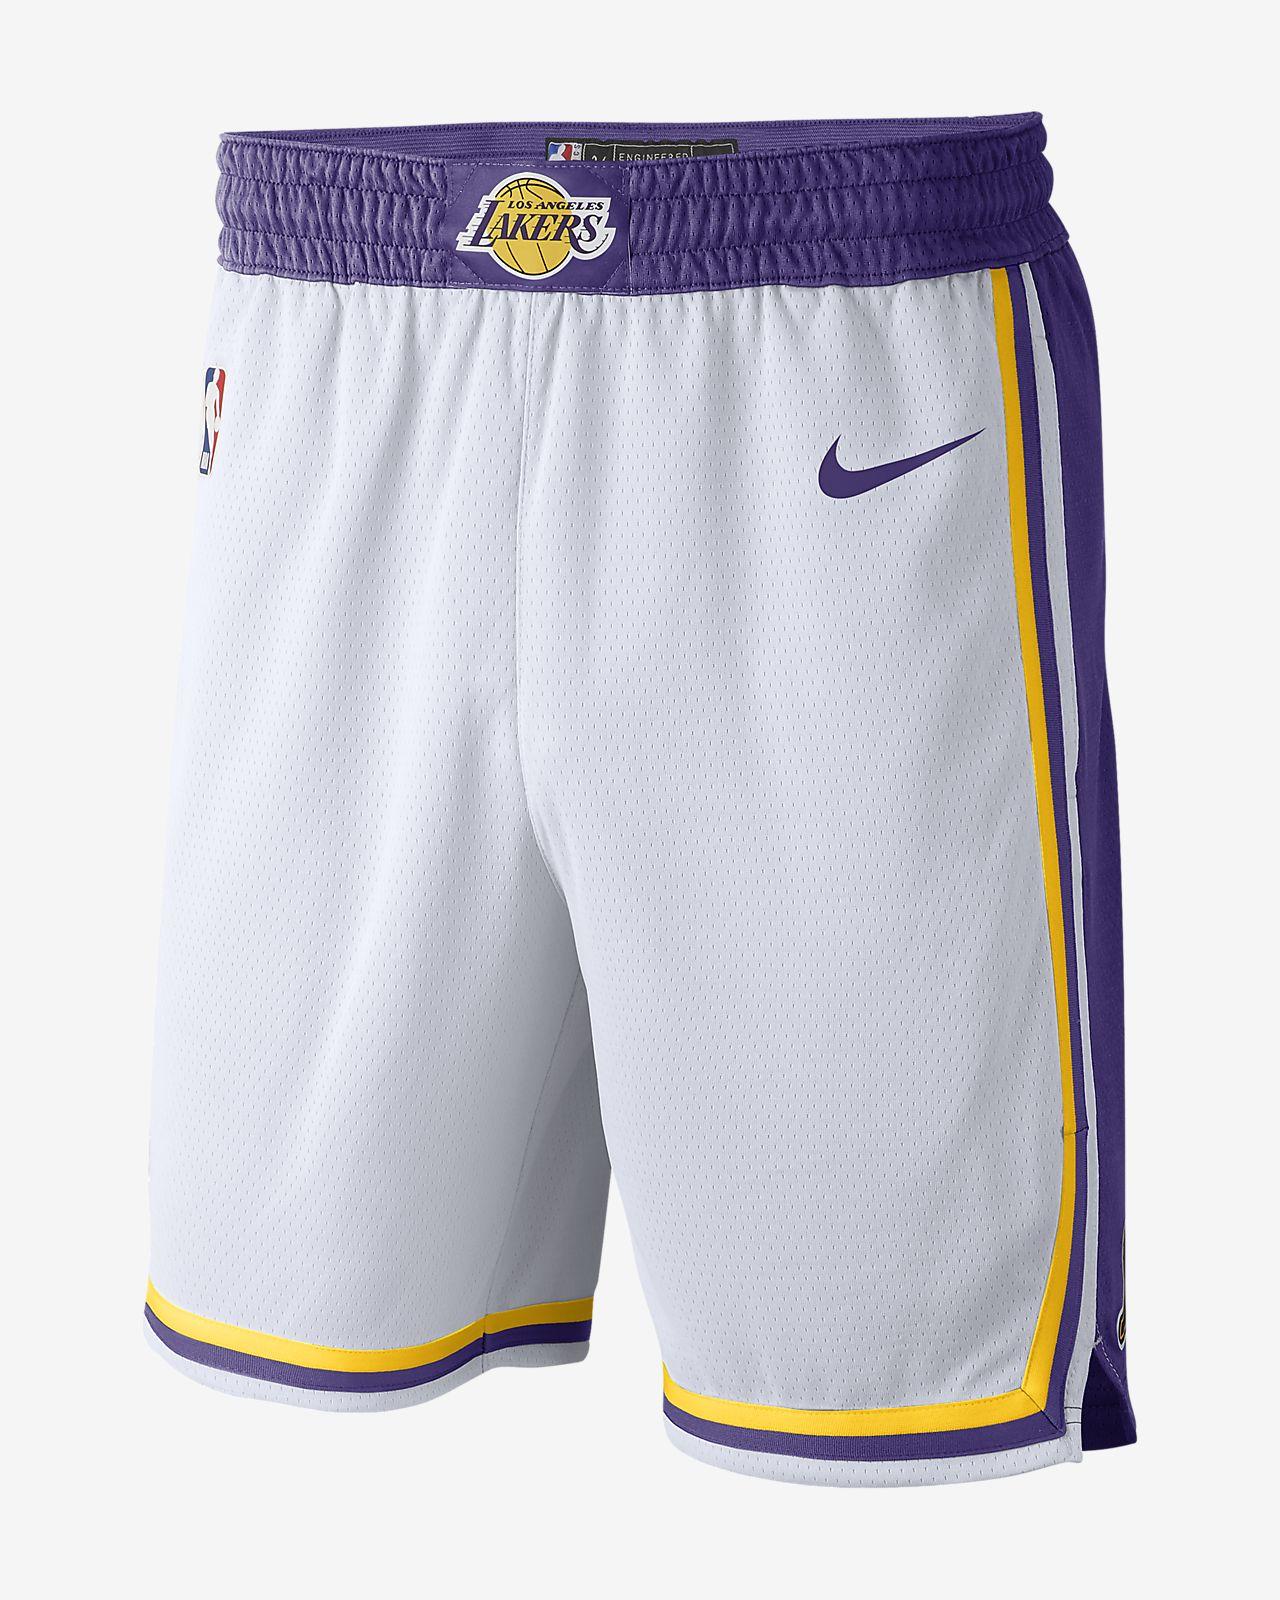 Los Angeles Lakers Association Edition Swingman Men's Nike NBA Shorts